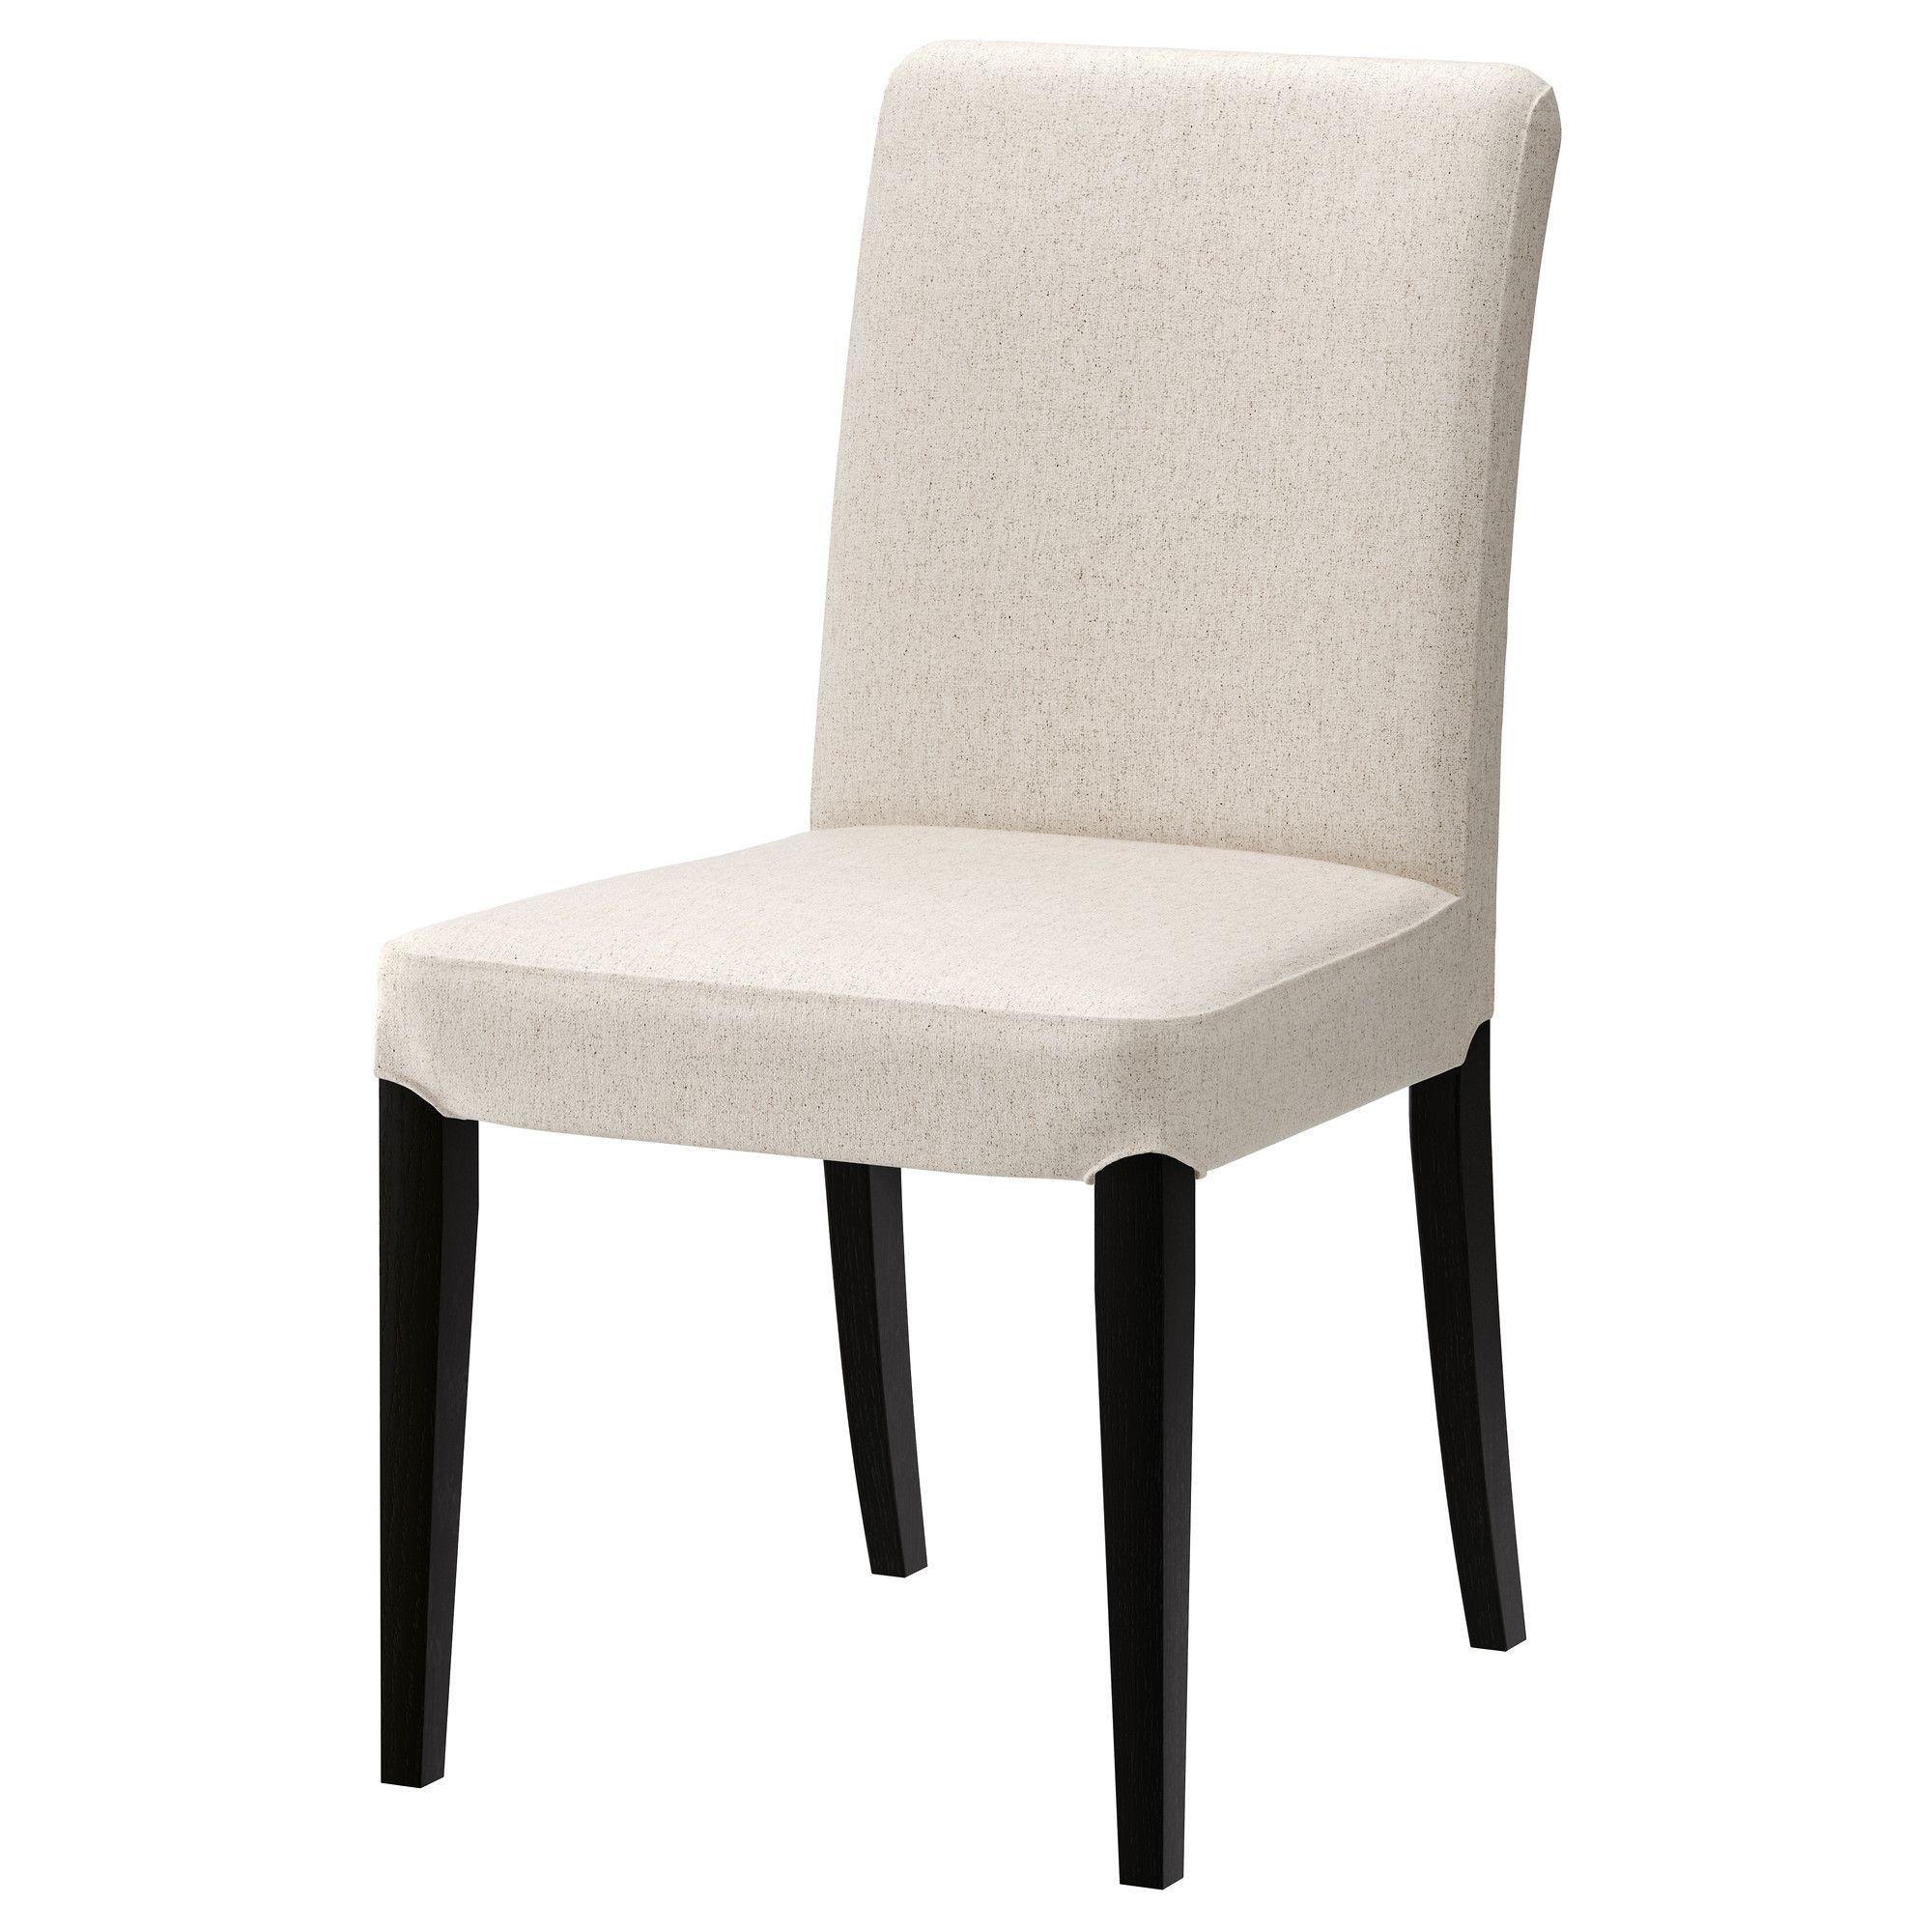 Henriksdal Chair  Linneryd Natural Brownblack  Ikea  My Ikea Brilliant Ikea Dining Room Chair Design Decoration